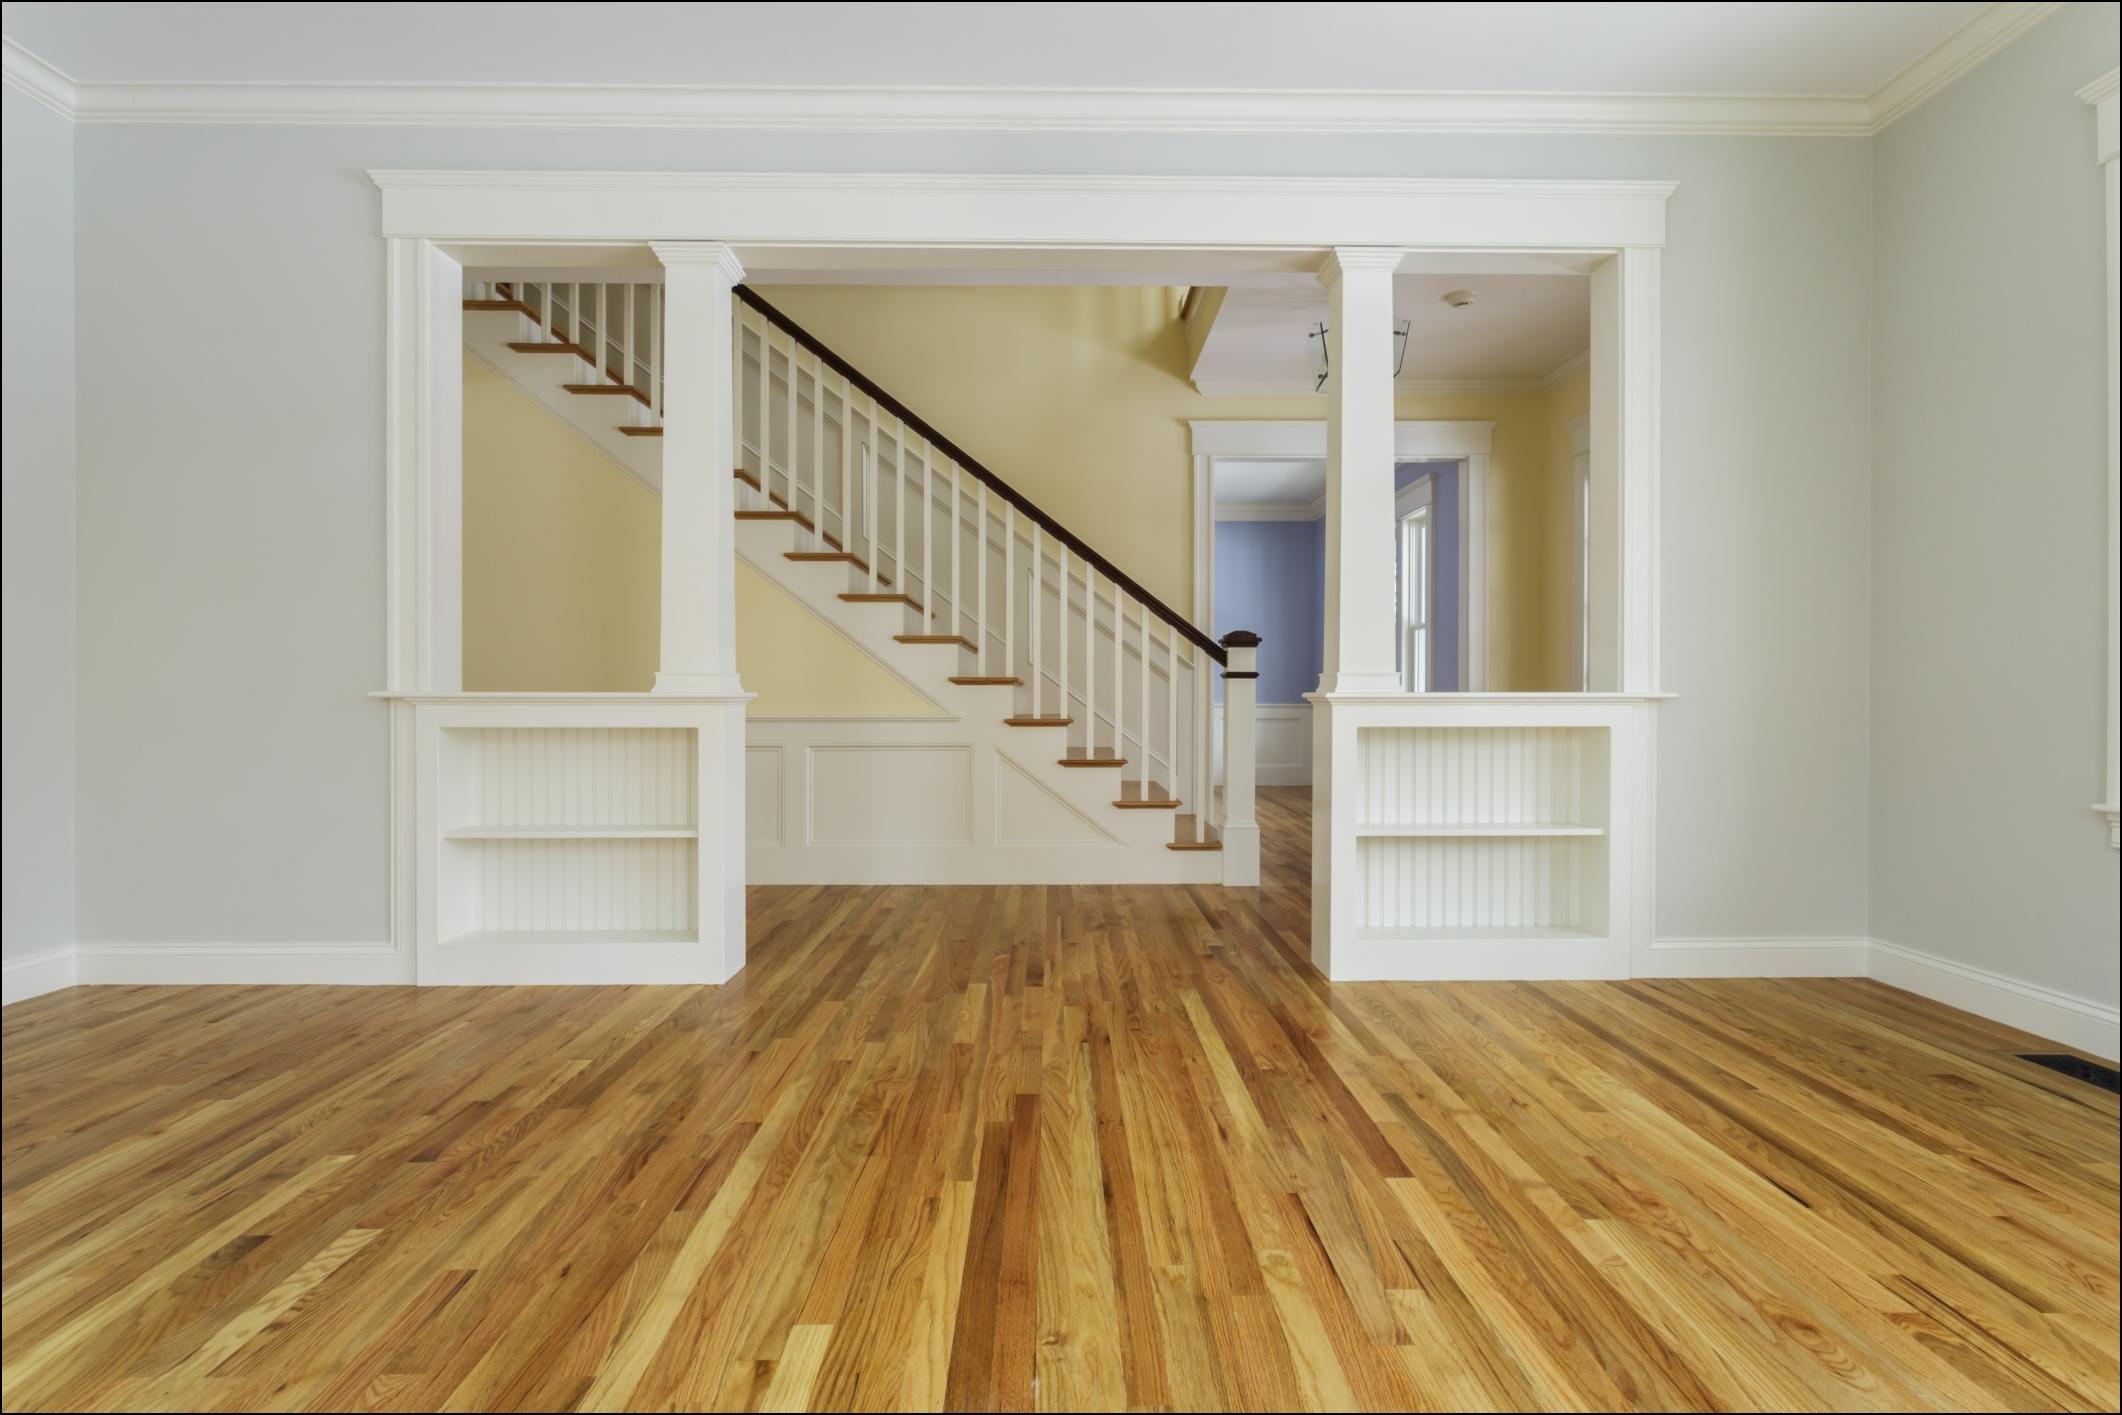 hardwood flooring retailers toronto of hardwood flooring suppliers france flooring ideas inside hardwood flooring cost for 1000 square feet stock guide to solid hardwood floors of hardwood flooring